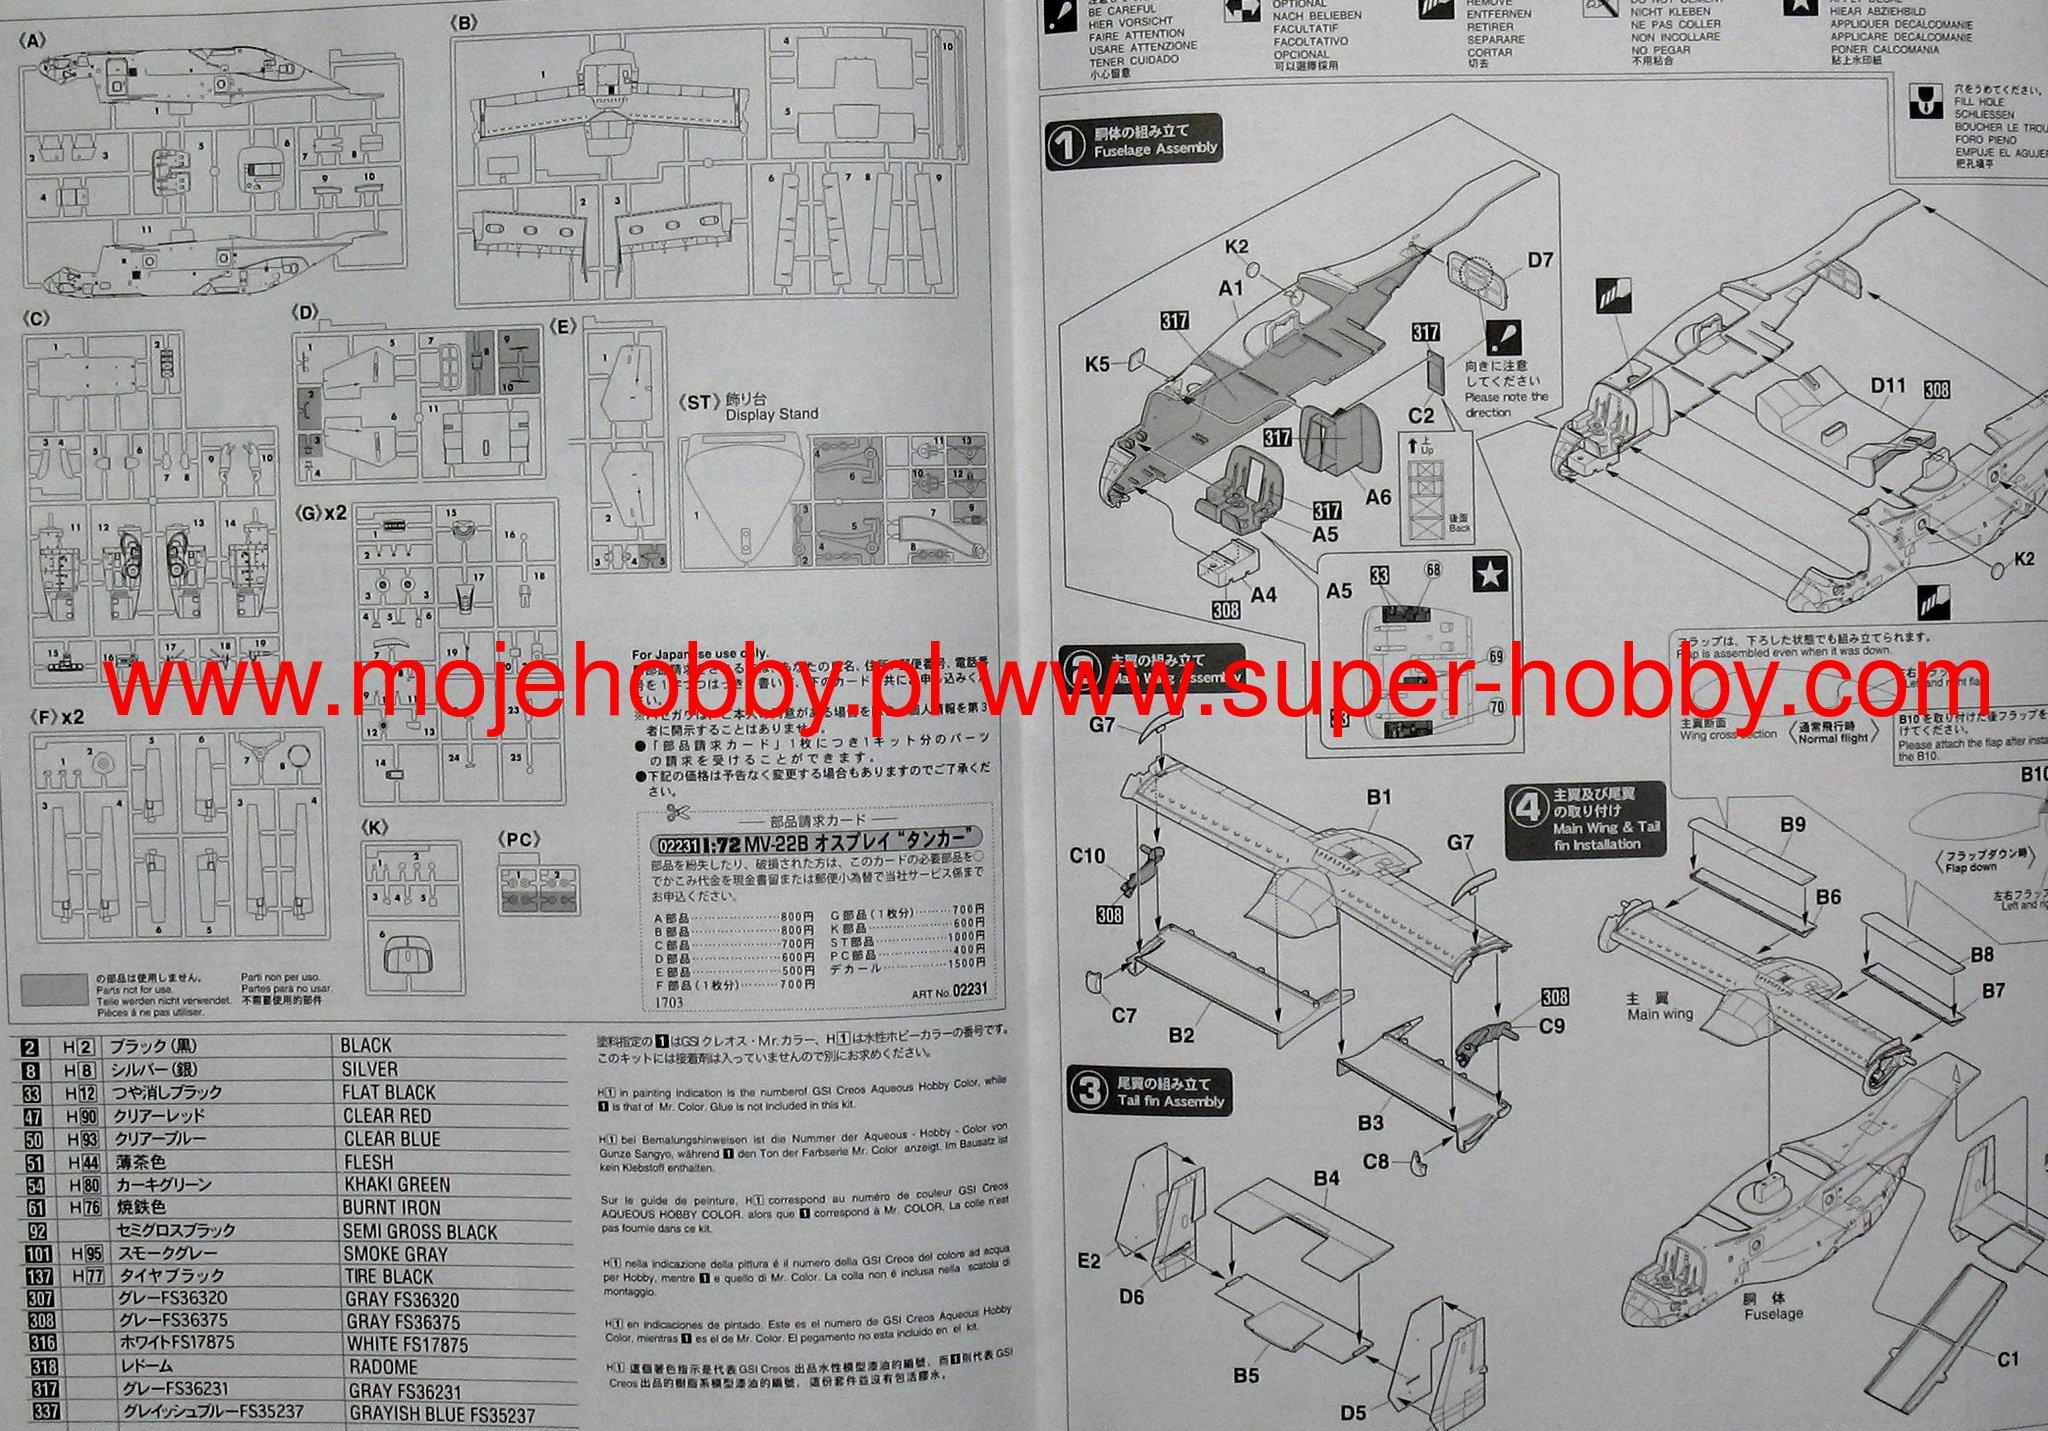 Mv 22b Osprey Tanker Hasegawa 02231 Schematic Diagram X2 02 2 Has02231